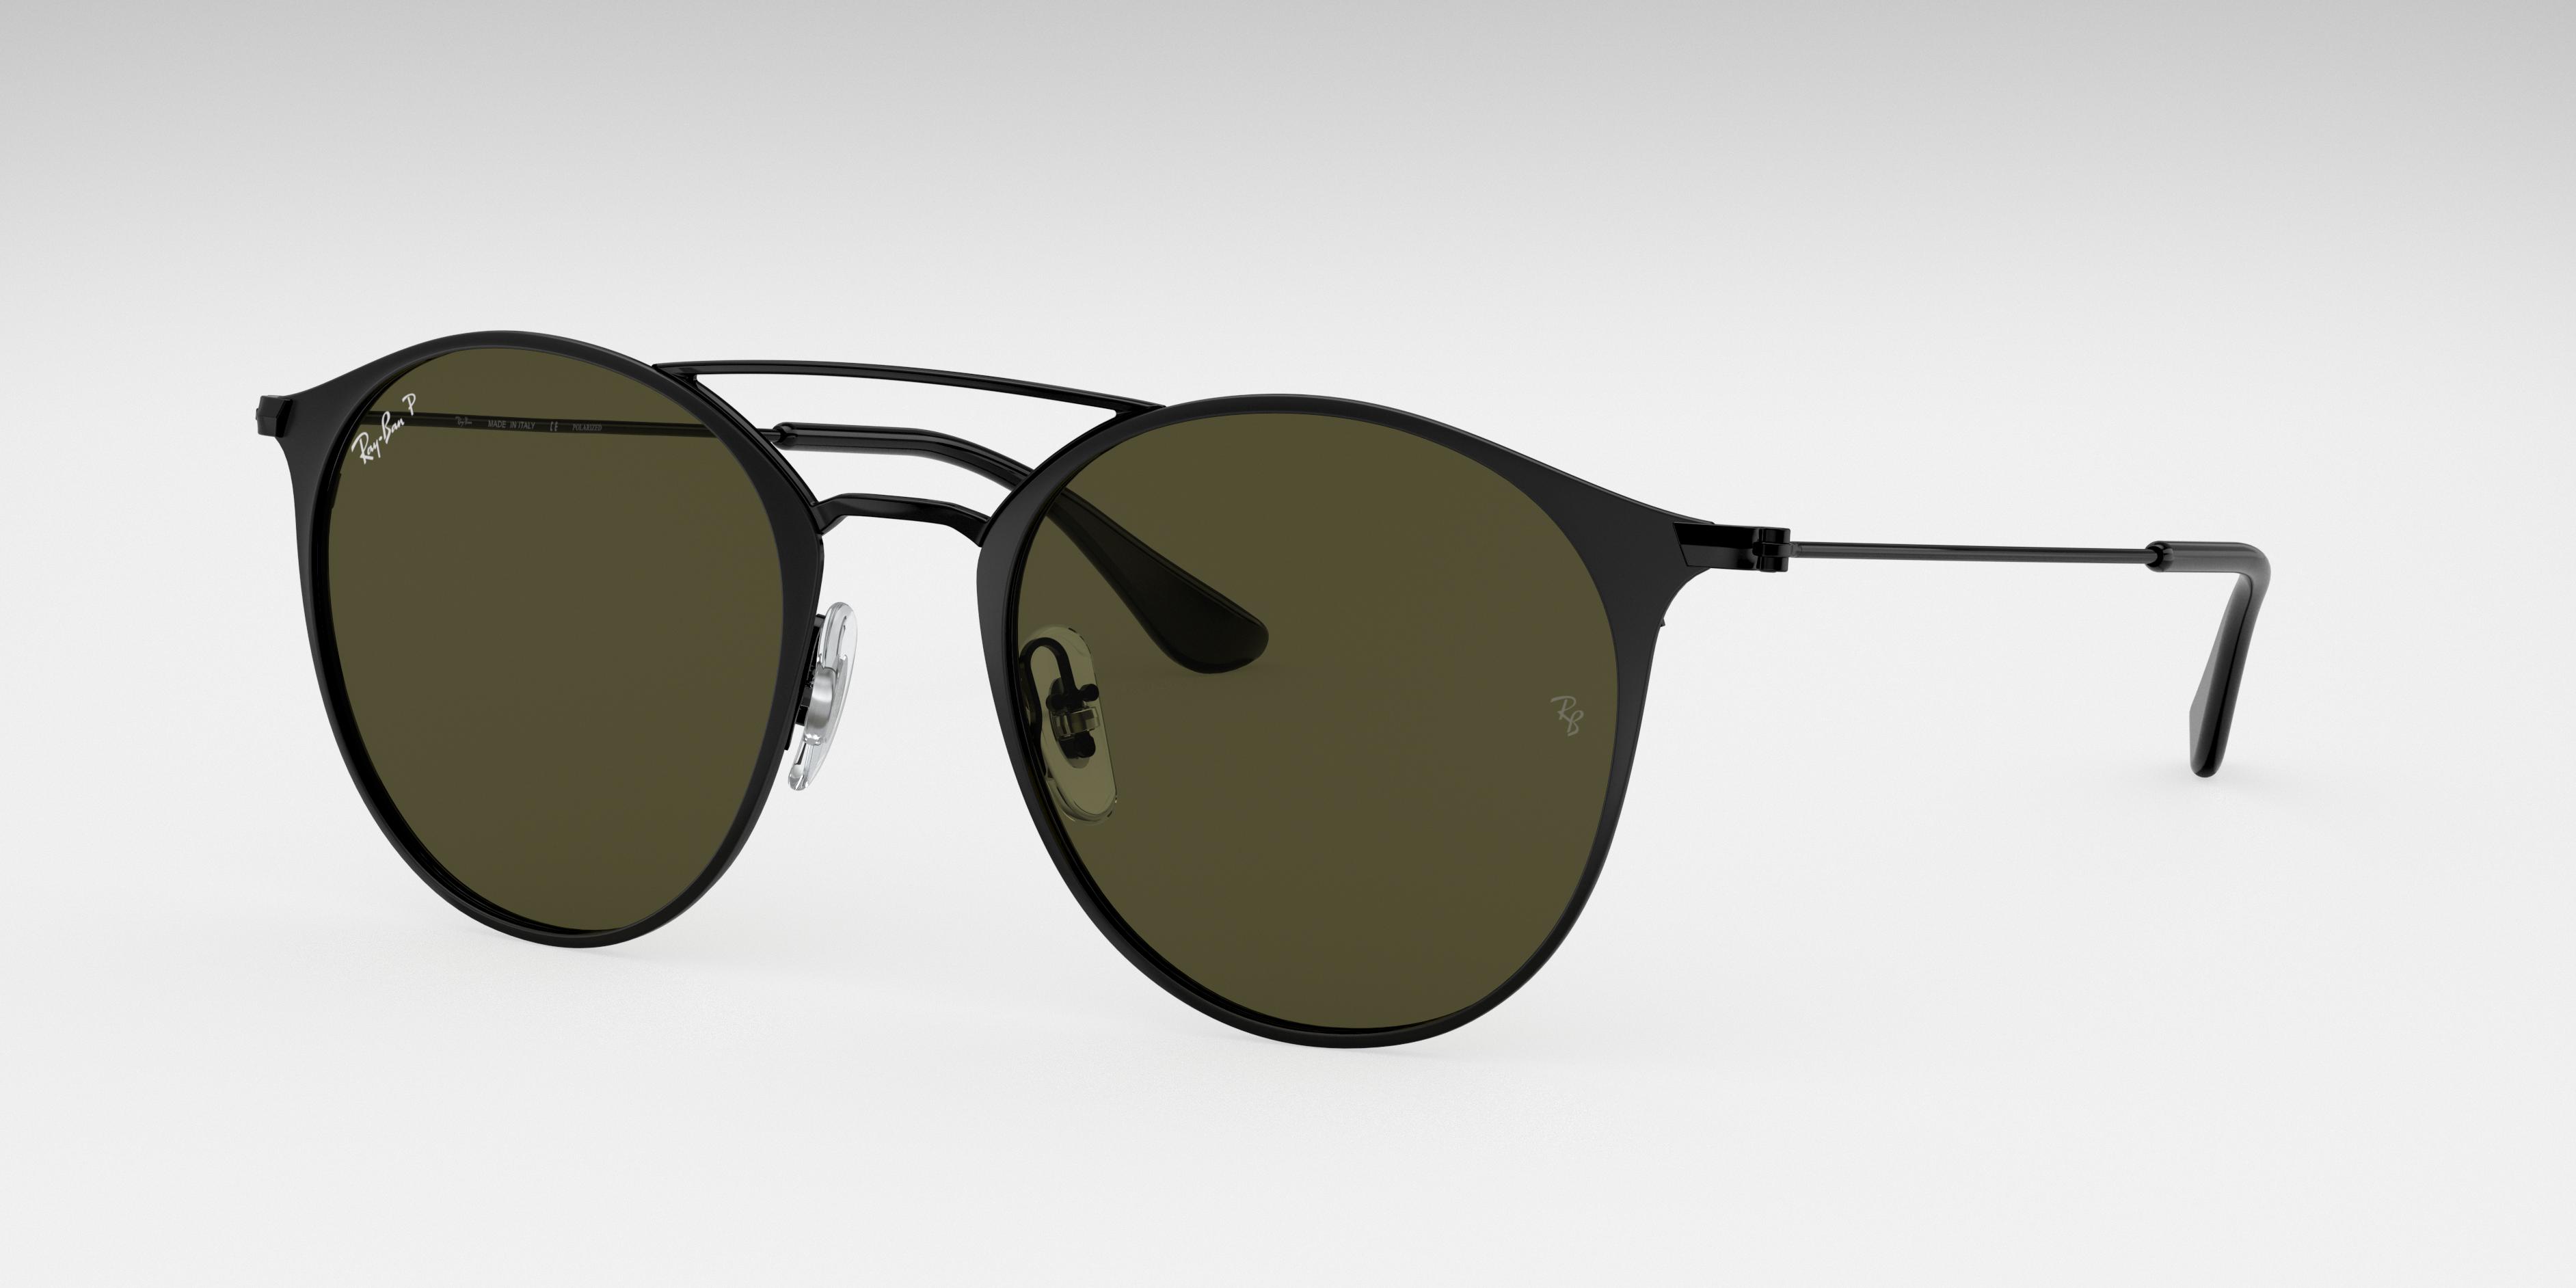 Ray-Ban Rb3546 Black, Polarized Green Lenses - RB3546